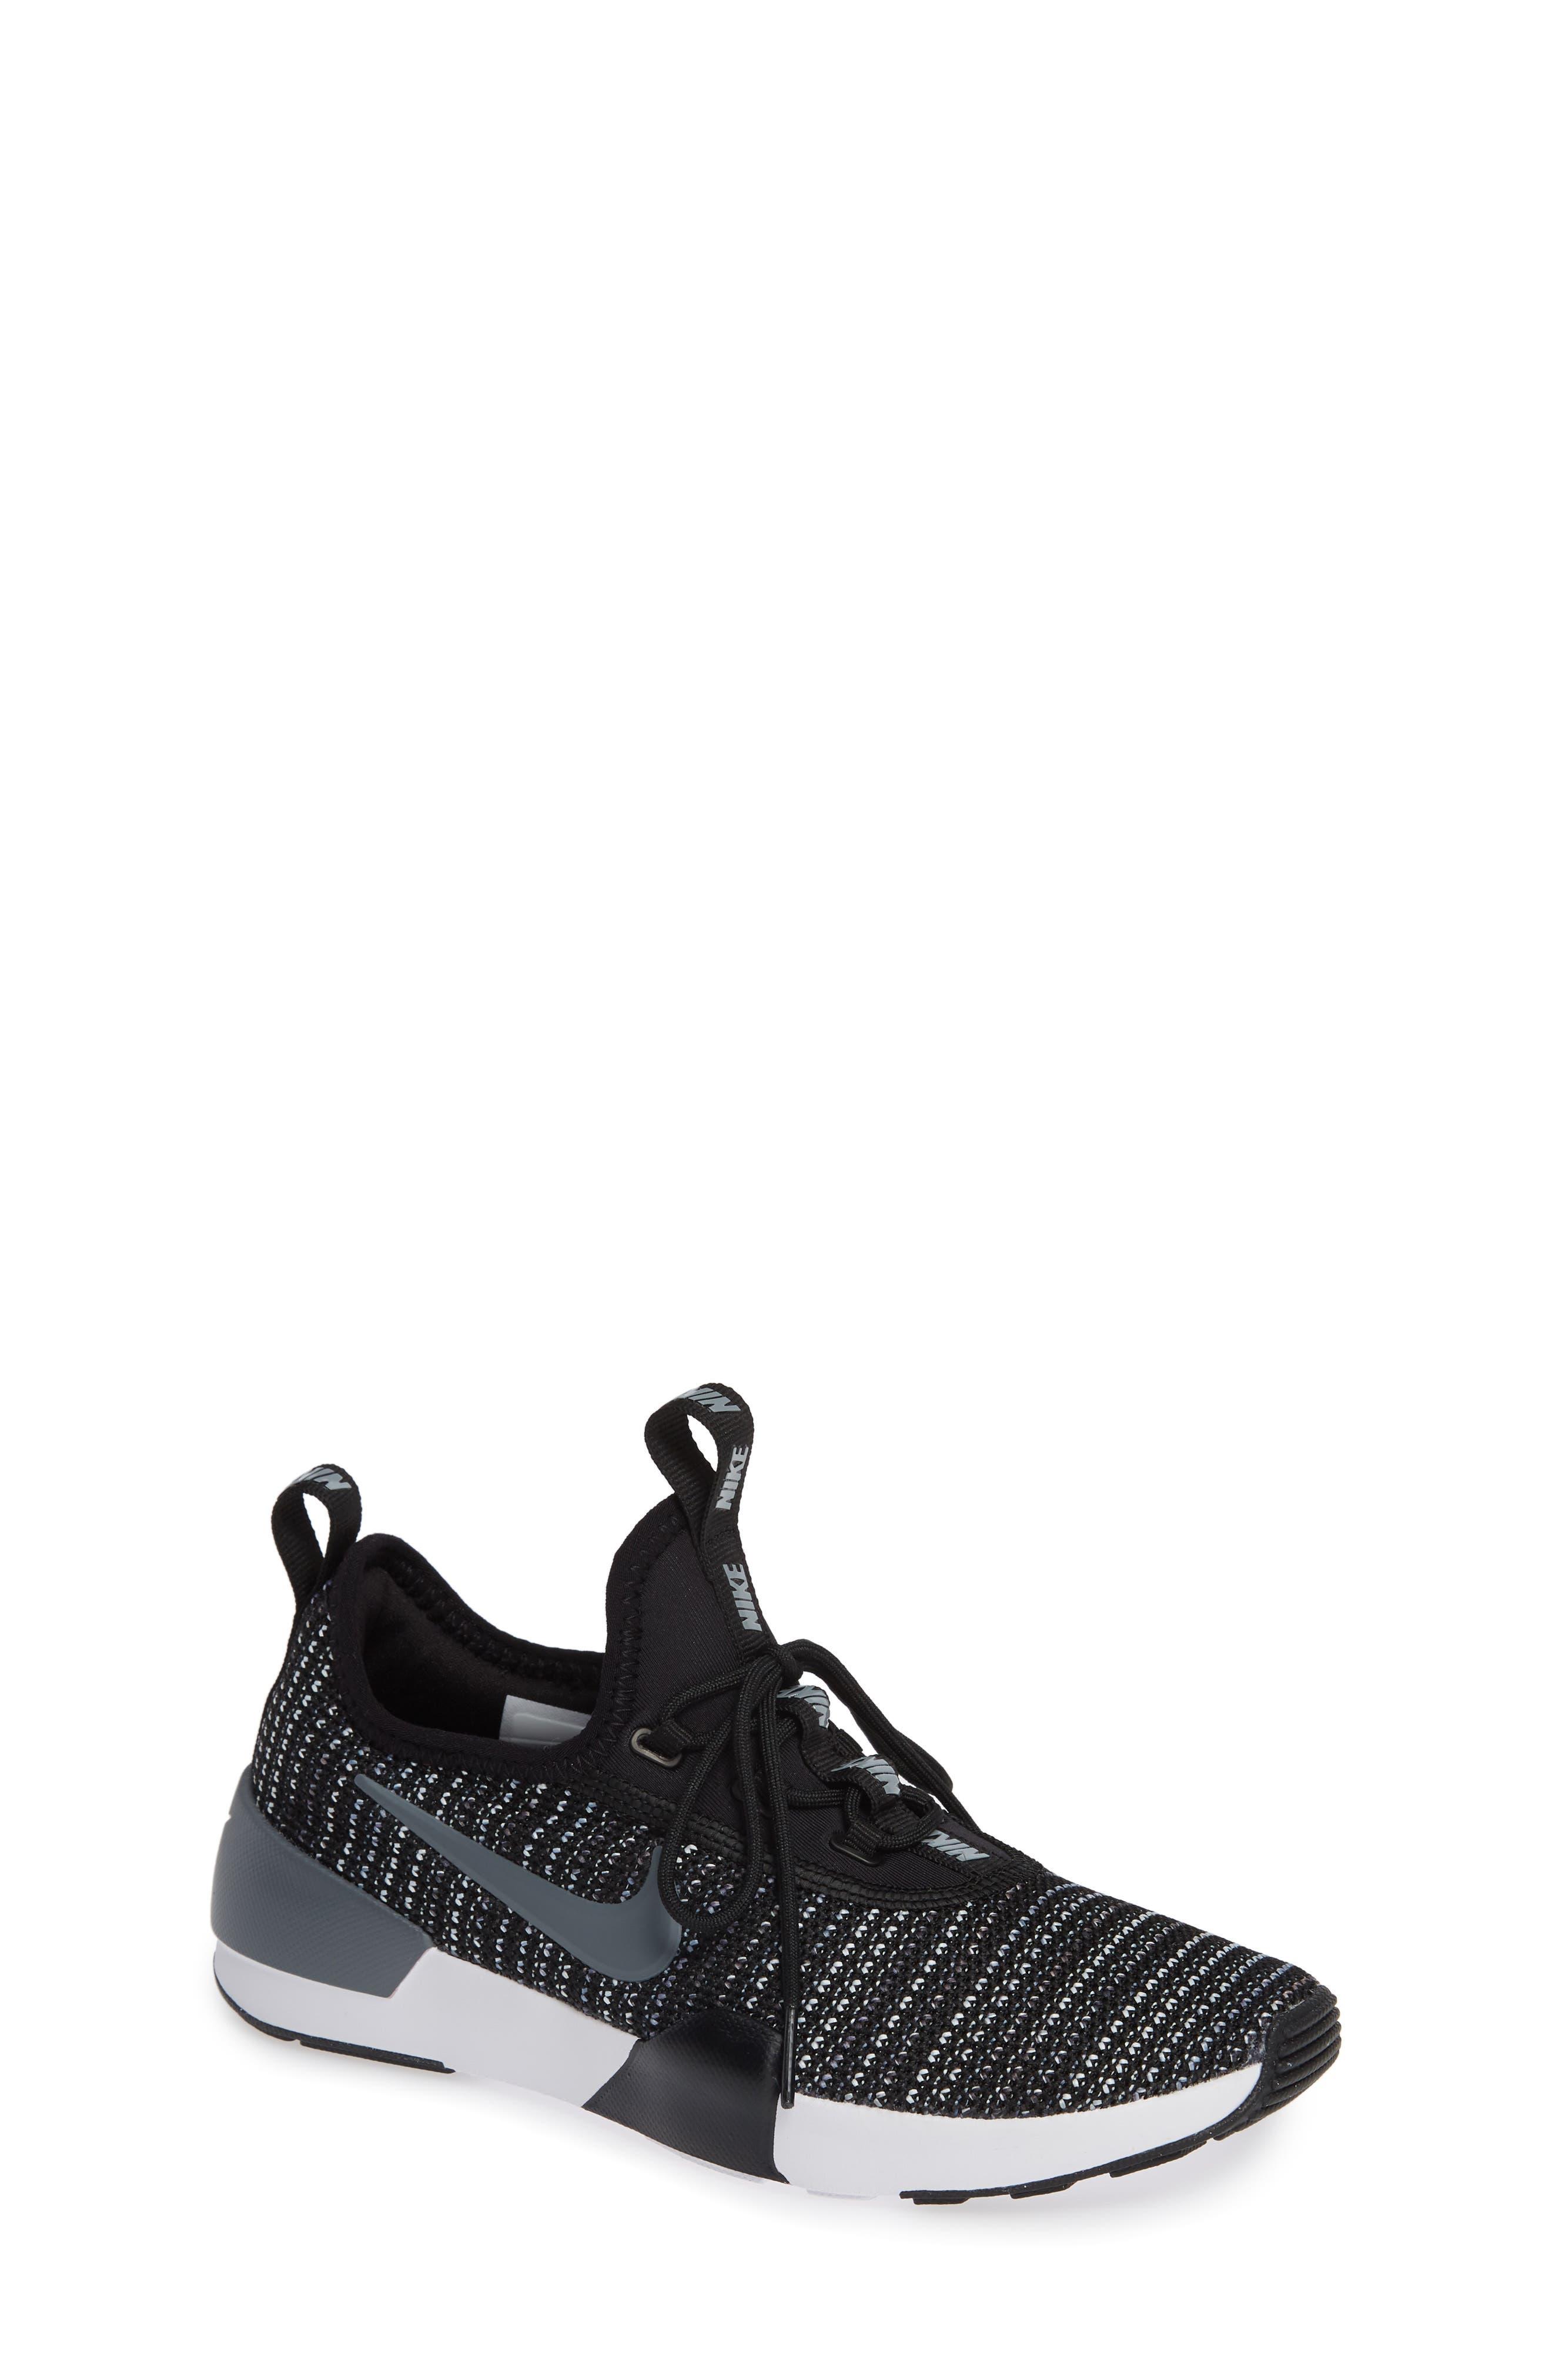 Ashin Modern Sock Knit Sneaker,                         Main,                         color, Black/ Cool Grey/ Anthracite